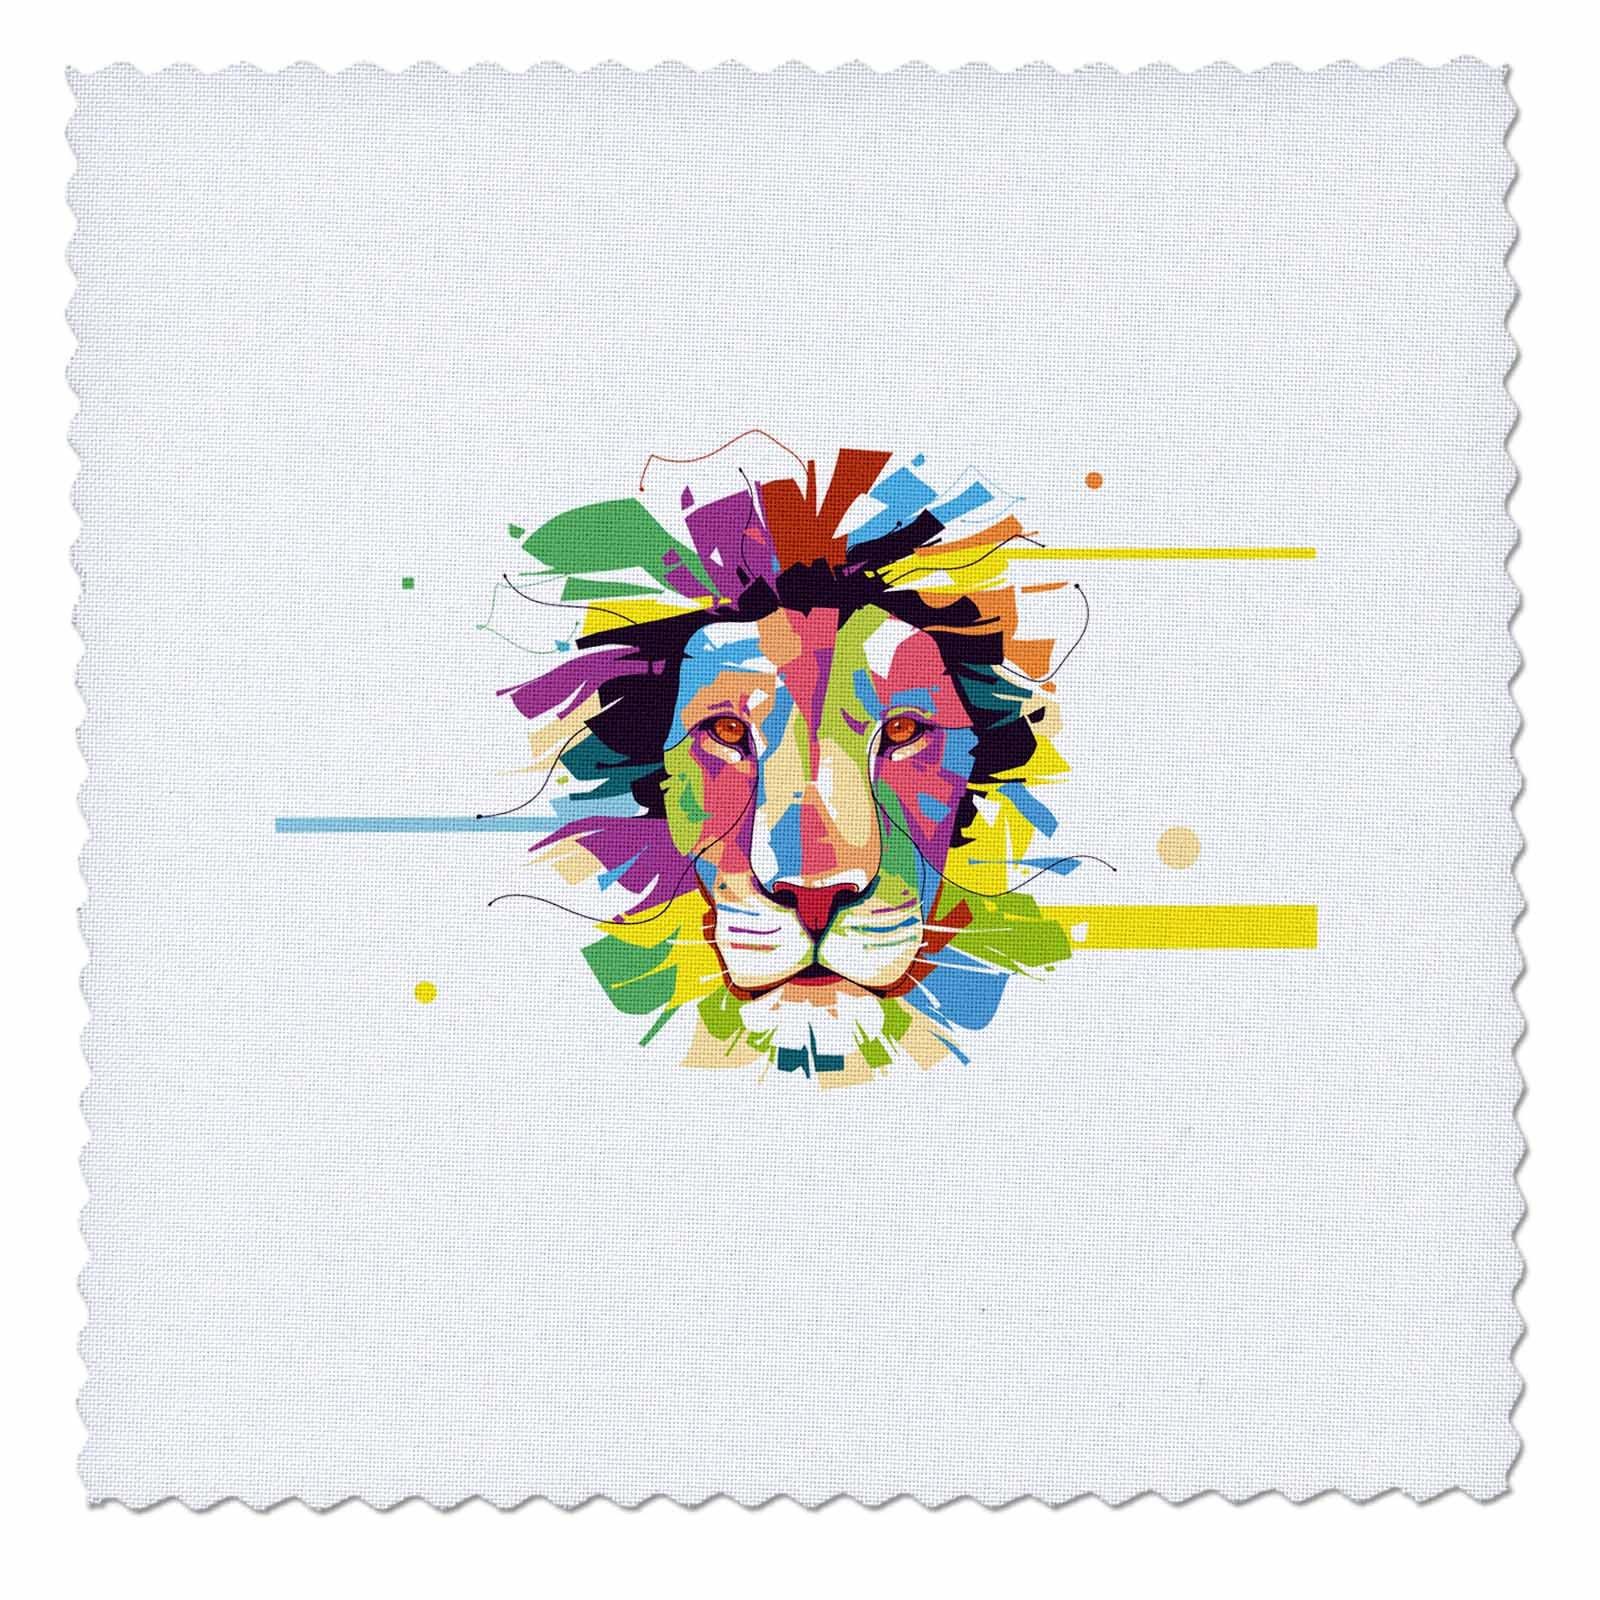 3dRose Sven Herkenrath Animal - Colorful Splash Design of Tiger Lion Head Portrait Wildlife - 14x14 inch quilt square (qs_280326_5)